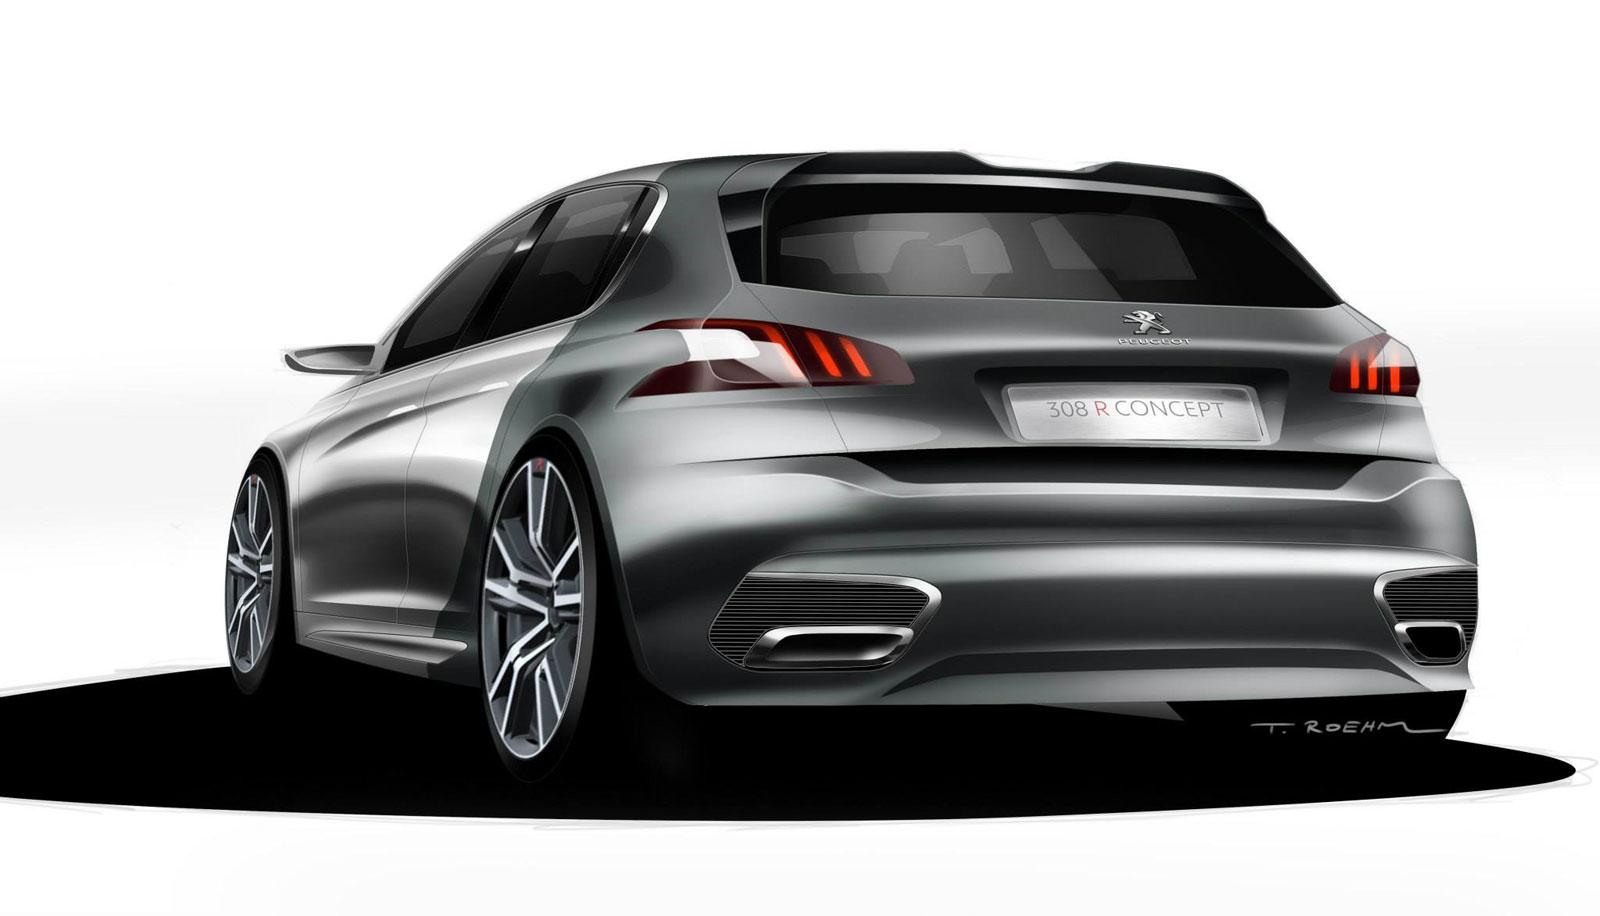 Peugeot 308 R Concept - Design Sketch